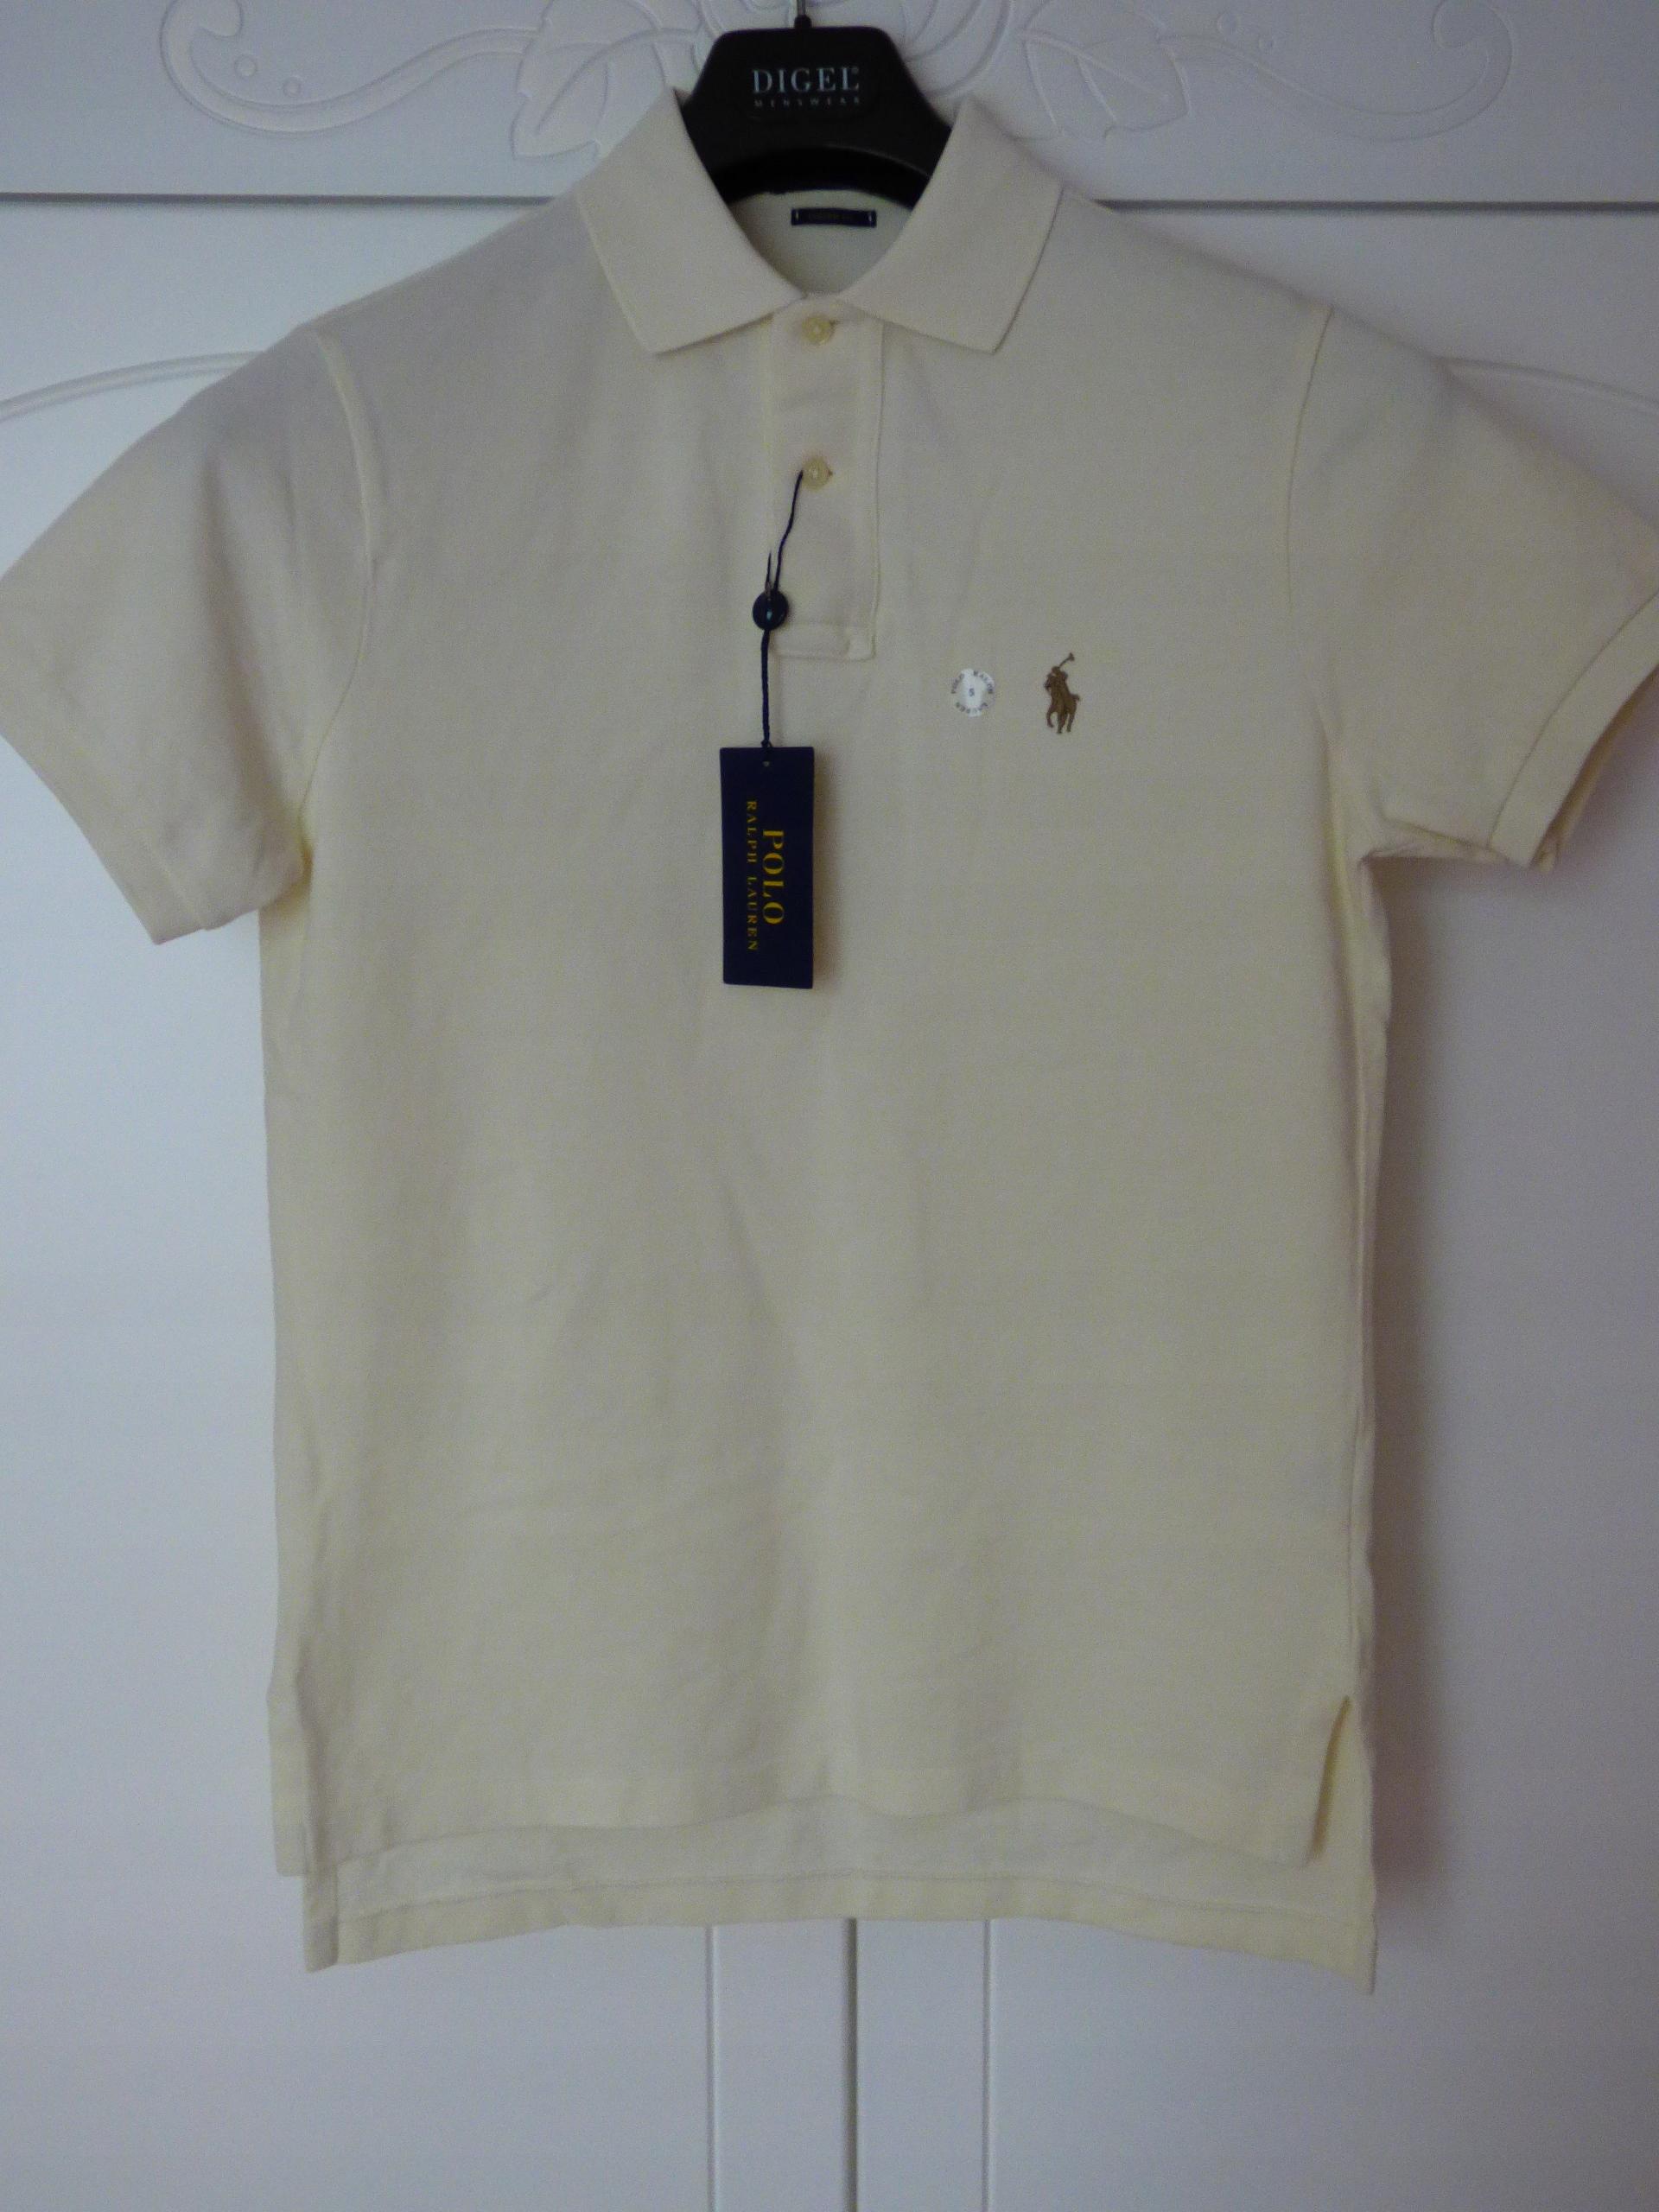 Ralph Lauren Polo koszulka polówka ecru roz S nowa